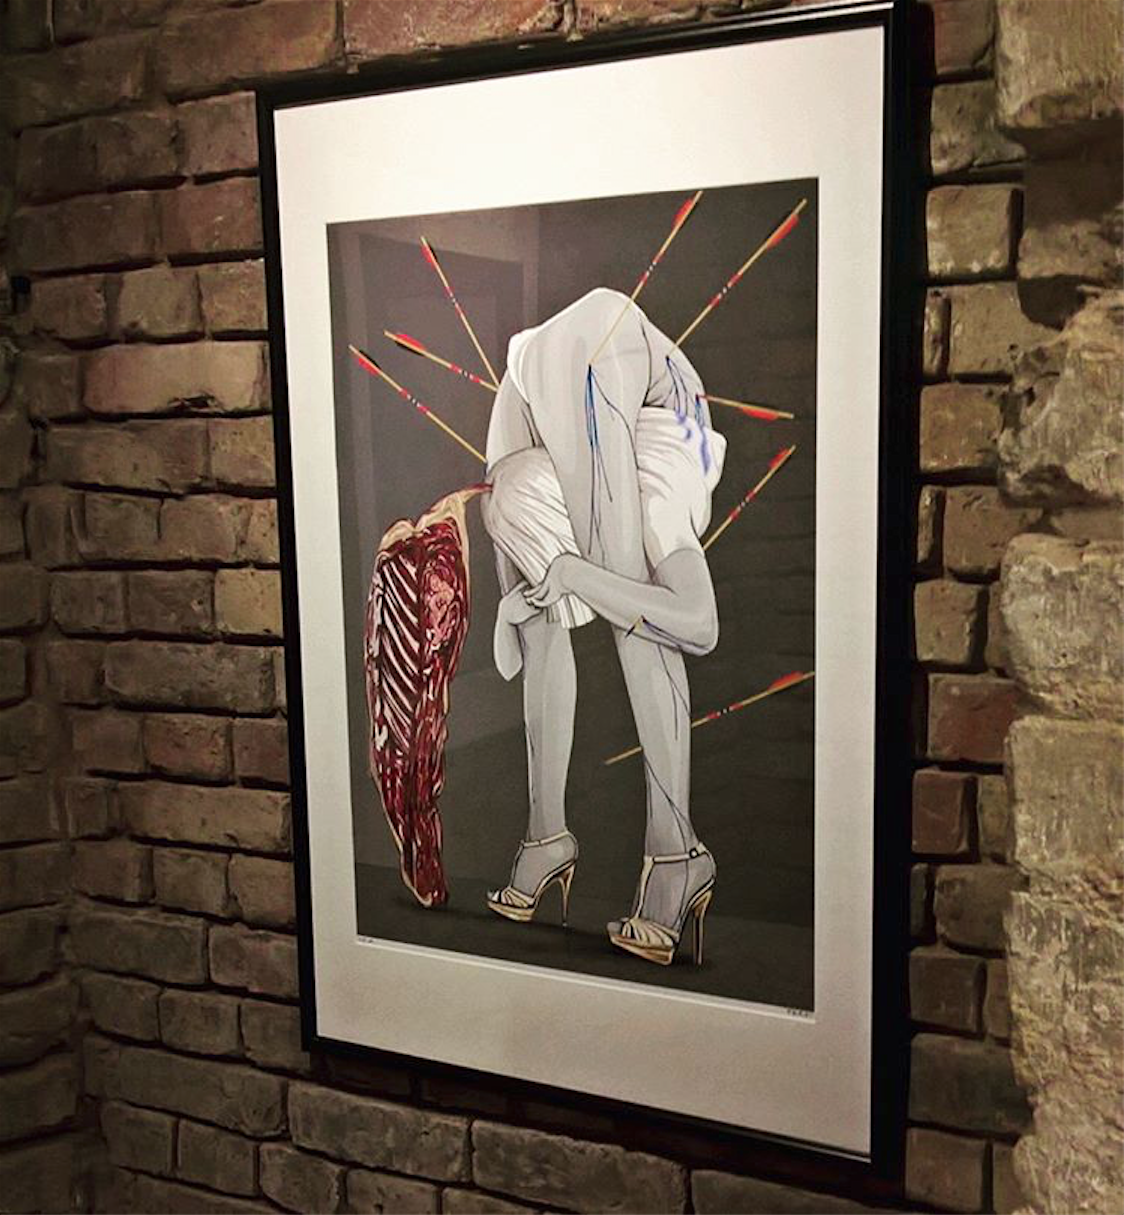 One of Espira's 'Tran-Sebastianne' prints hanging in a rock'n'roll home in east London